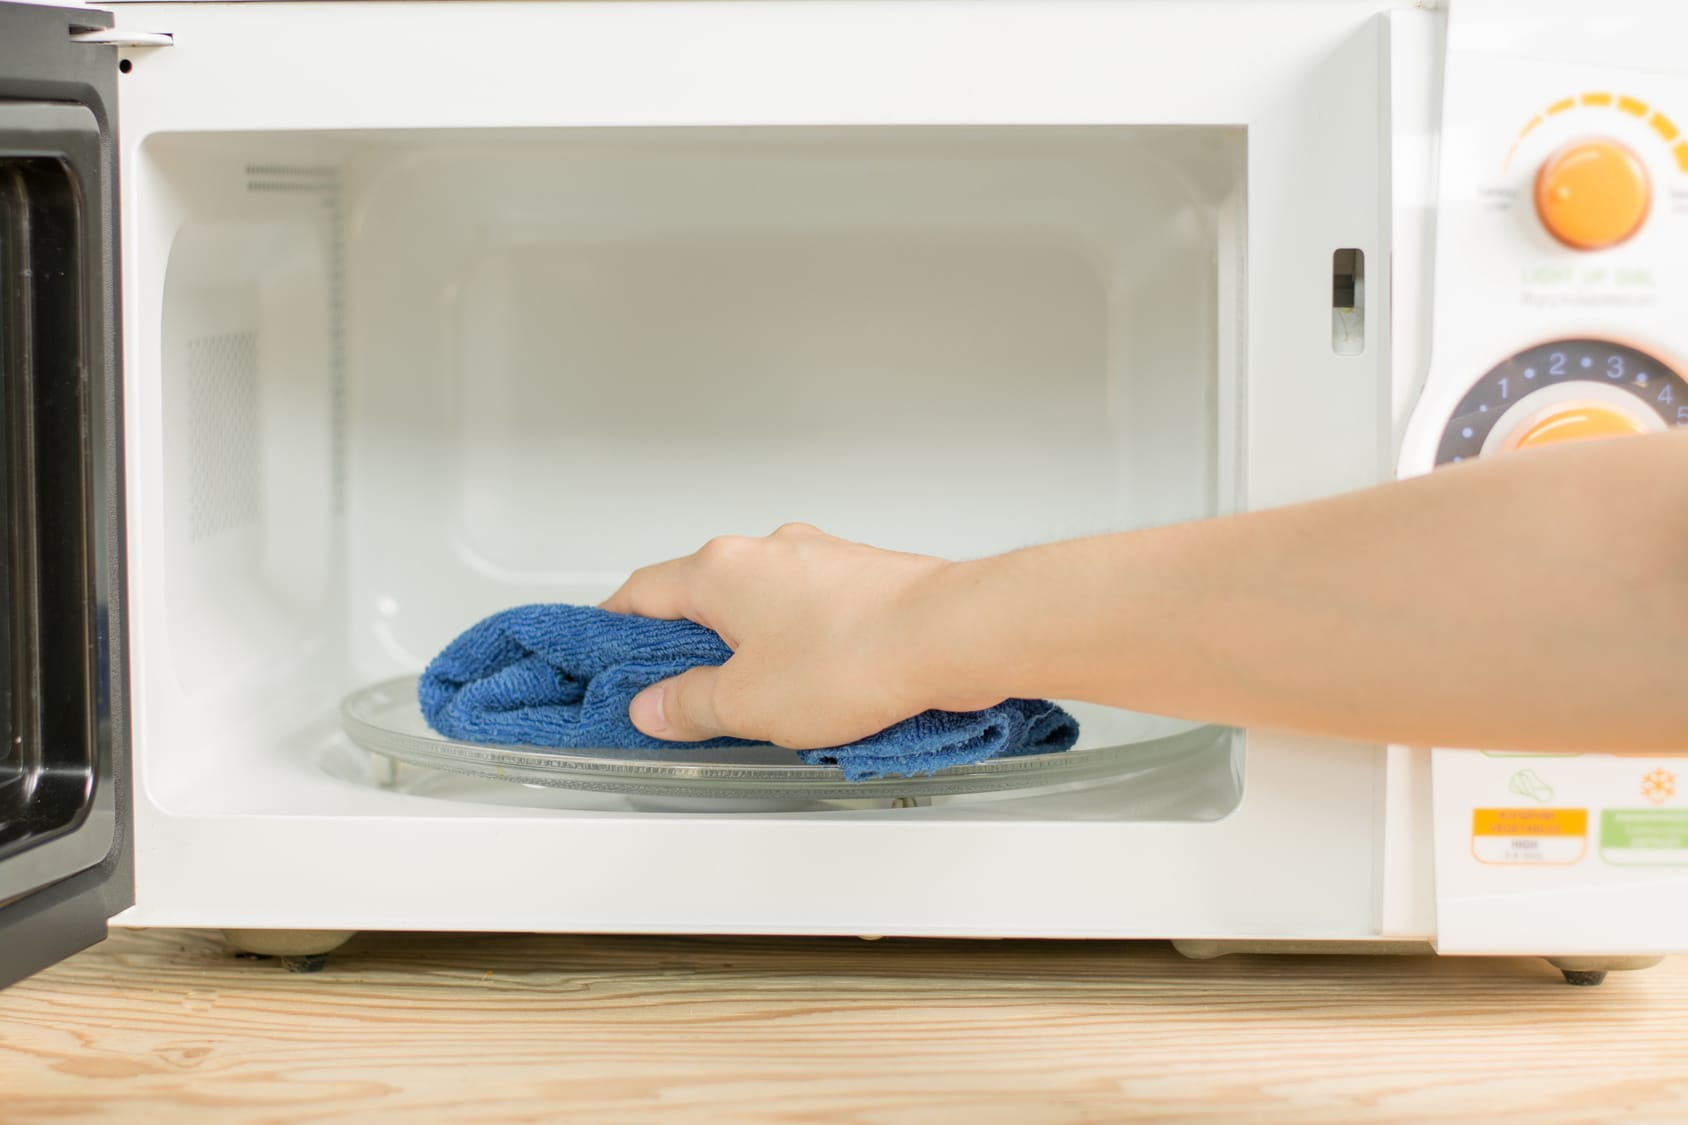 mikrowelle reinigen so klappt 39 s. Black Bedroom Furniture Sets. Home Design Ideas